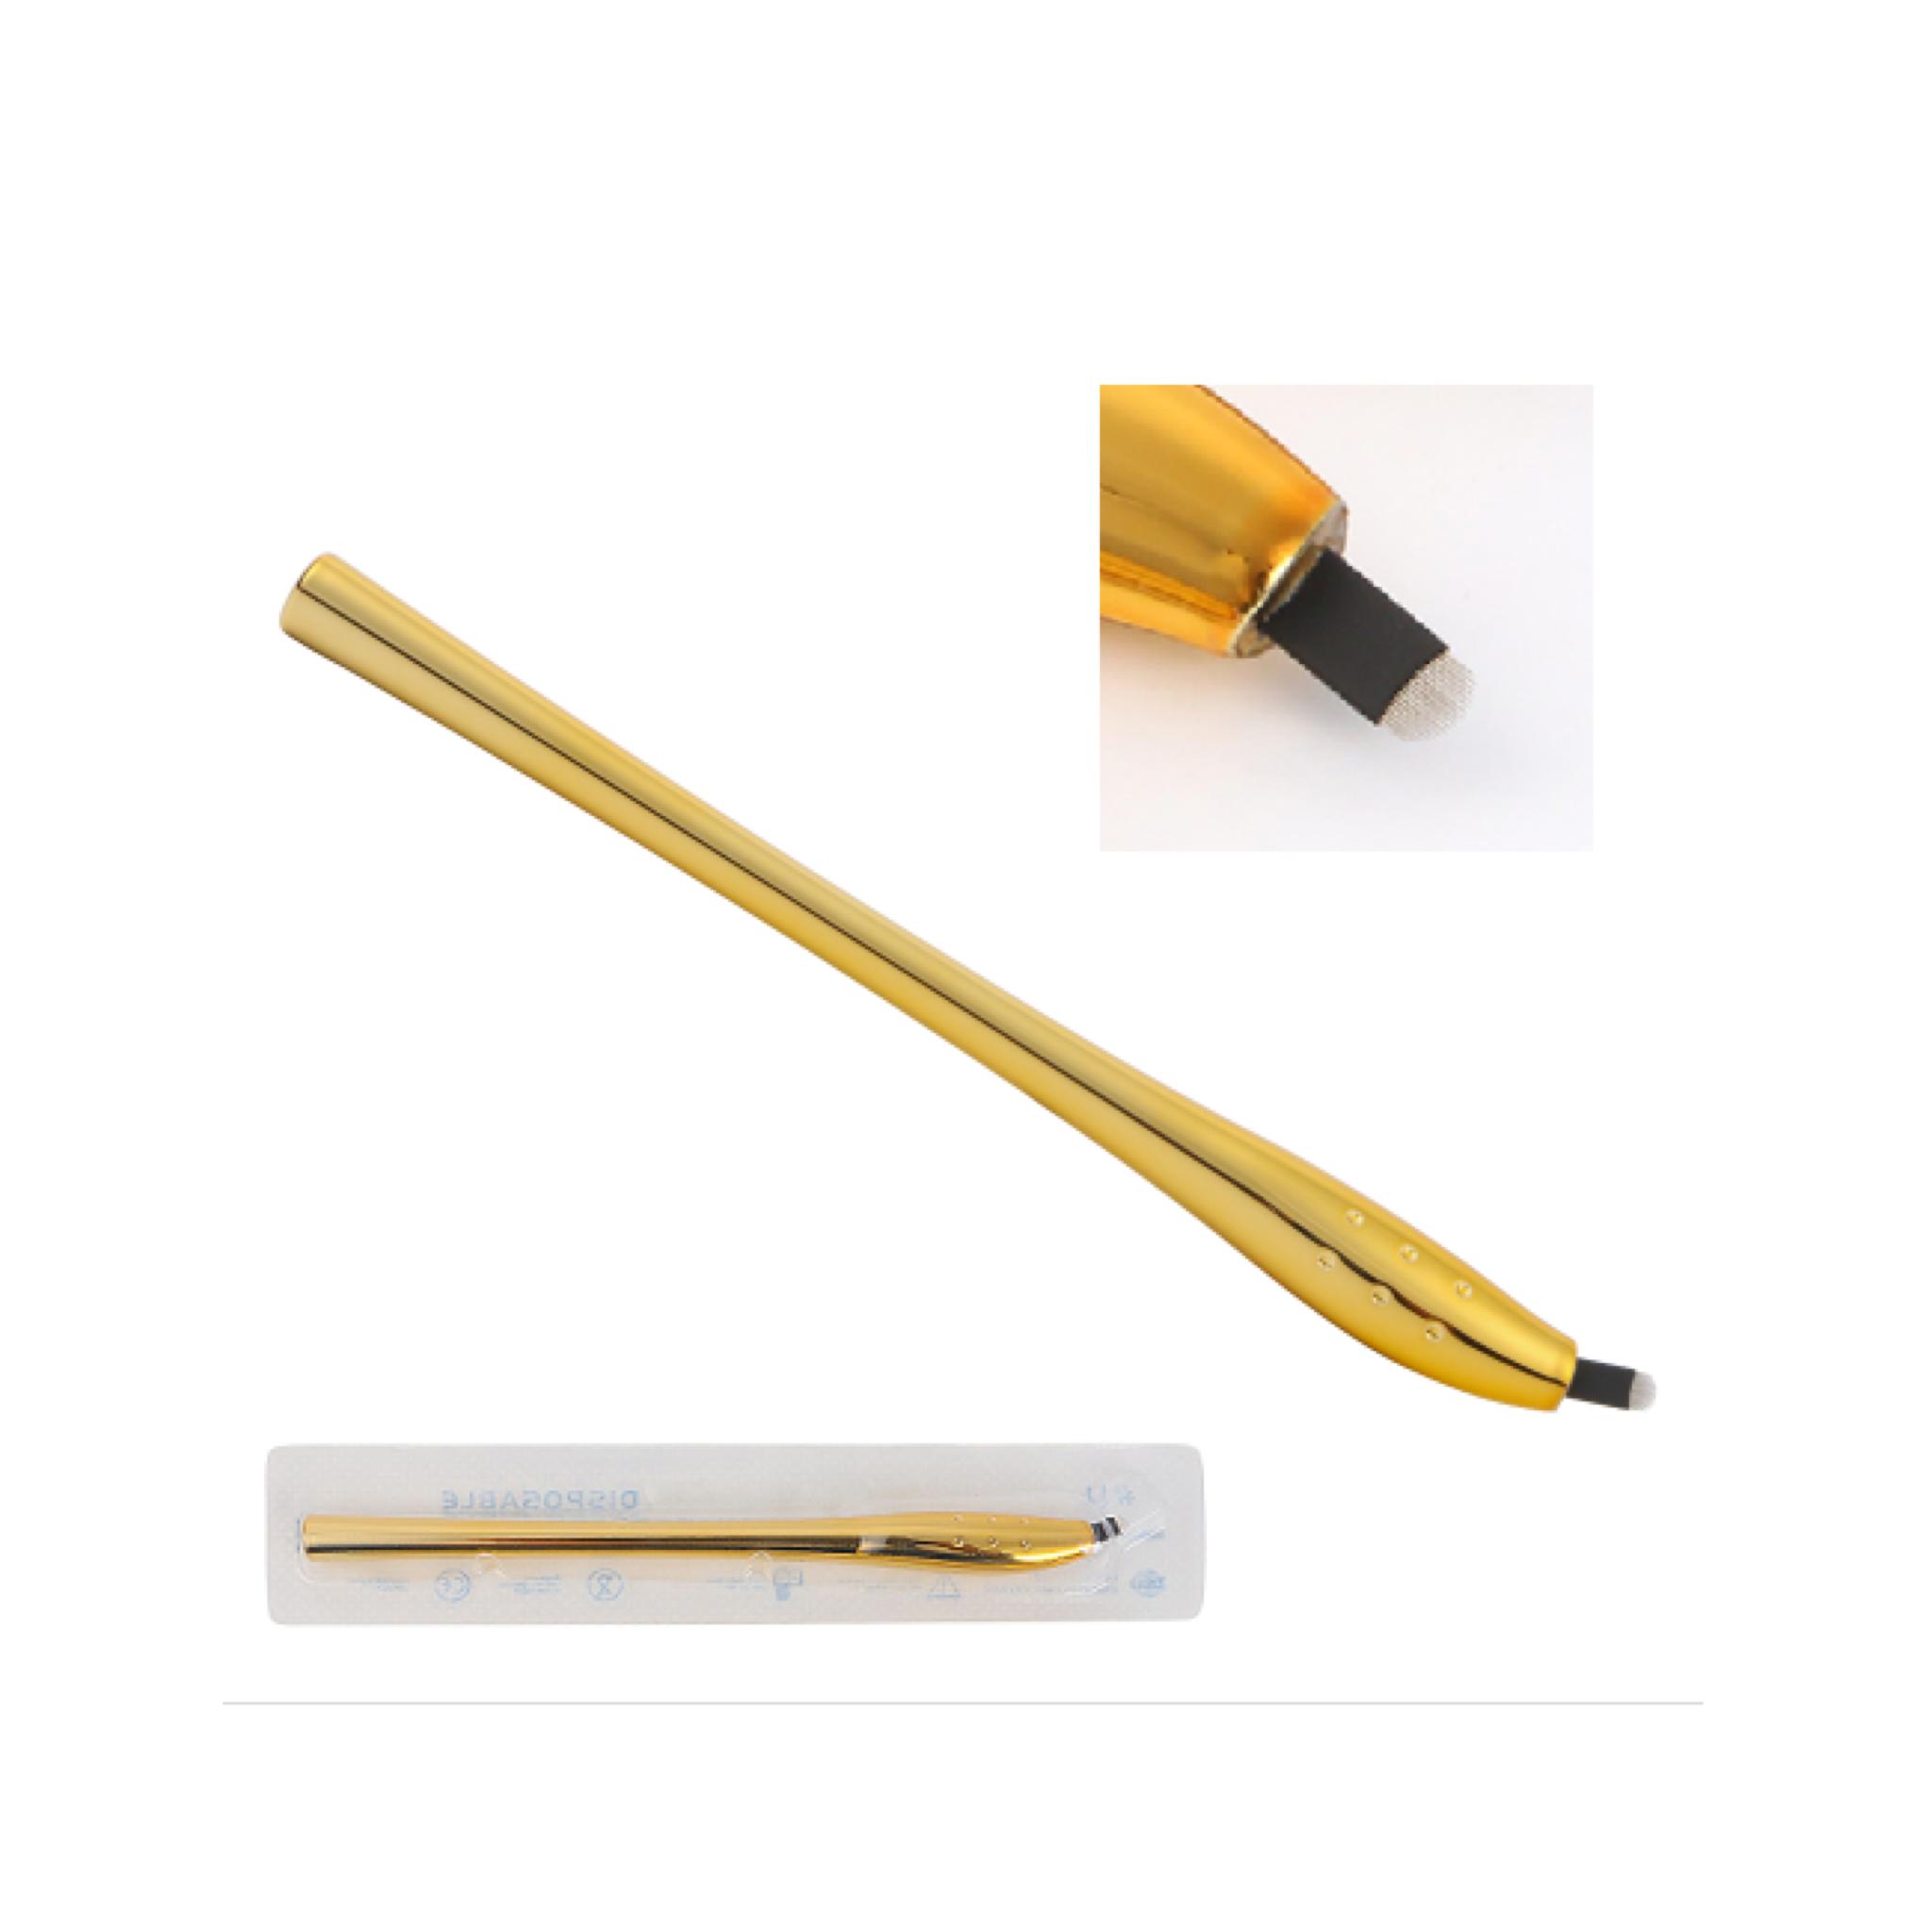 Microbladingnål och penna / Microblading needle and pen 0,20 mm